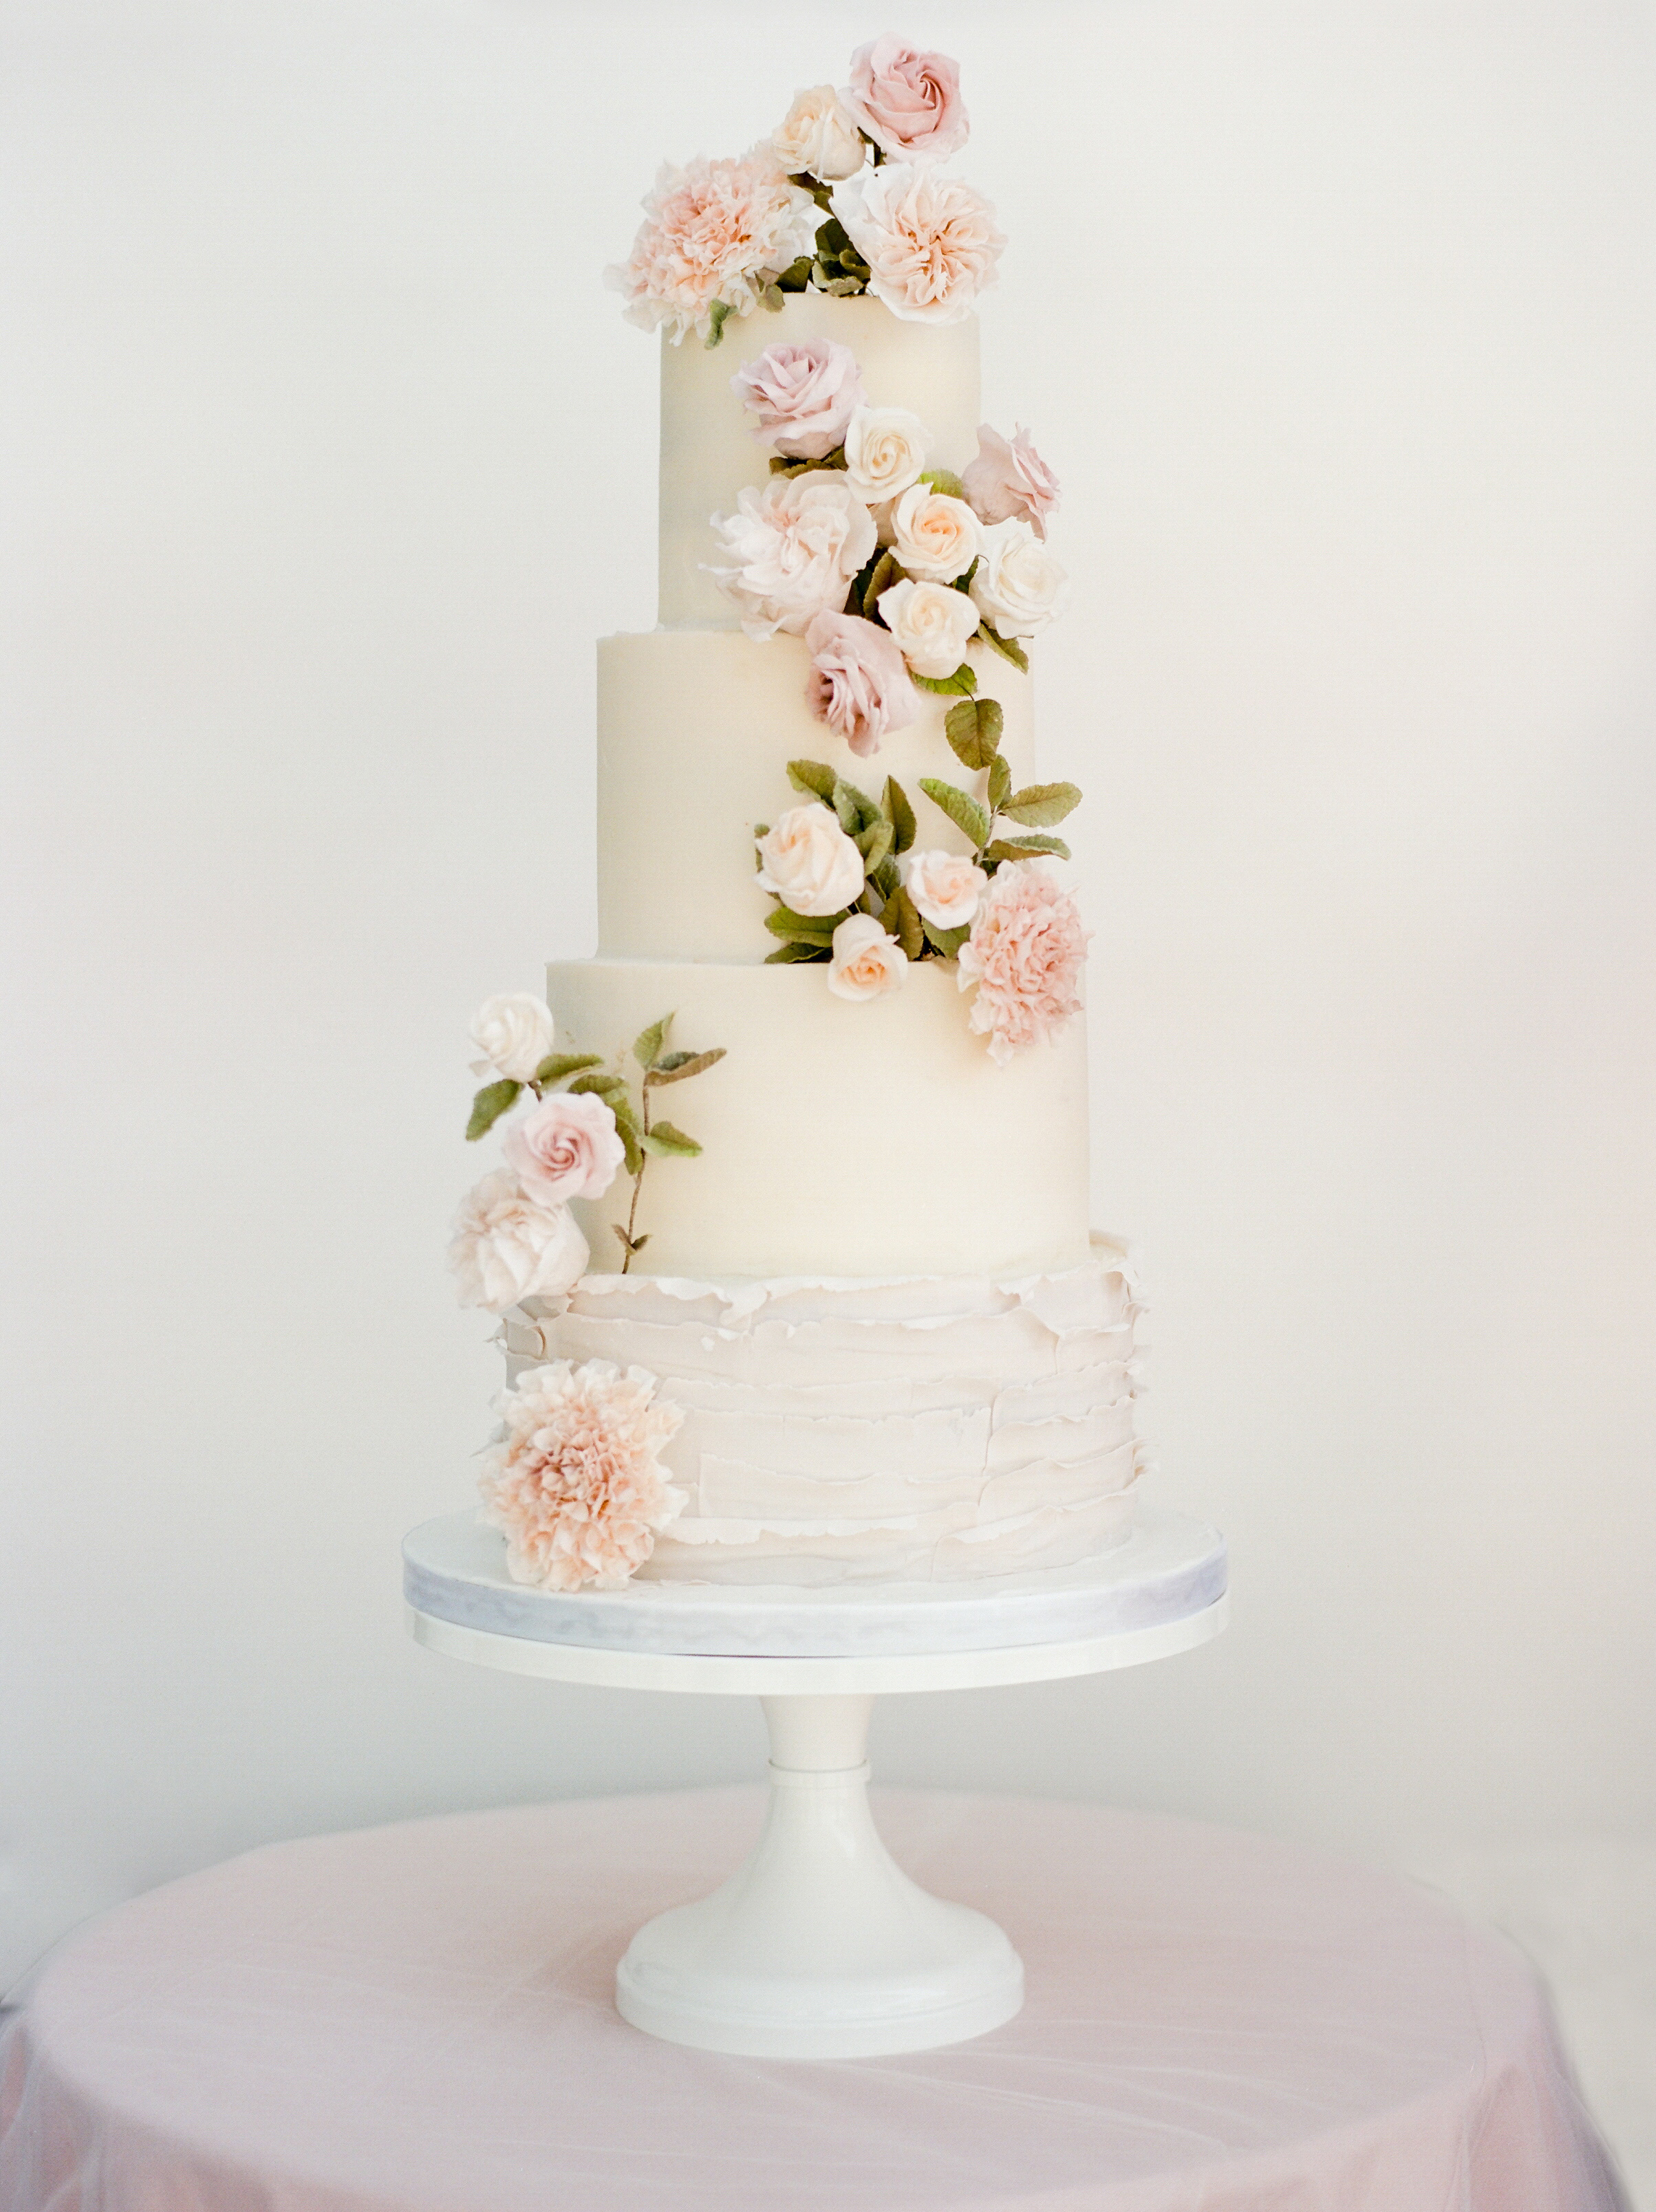 Martha-Stewart-Wedding-Dana-Fernandez-Photography-Josh-Texas-Film-Houston-Wedding-Fine-Art-Photographer-McGovern-Centennial-Gardens-Top-Best-213.jpg